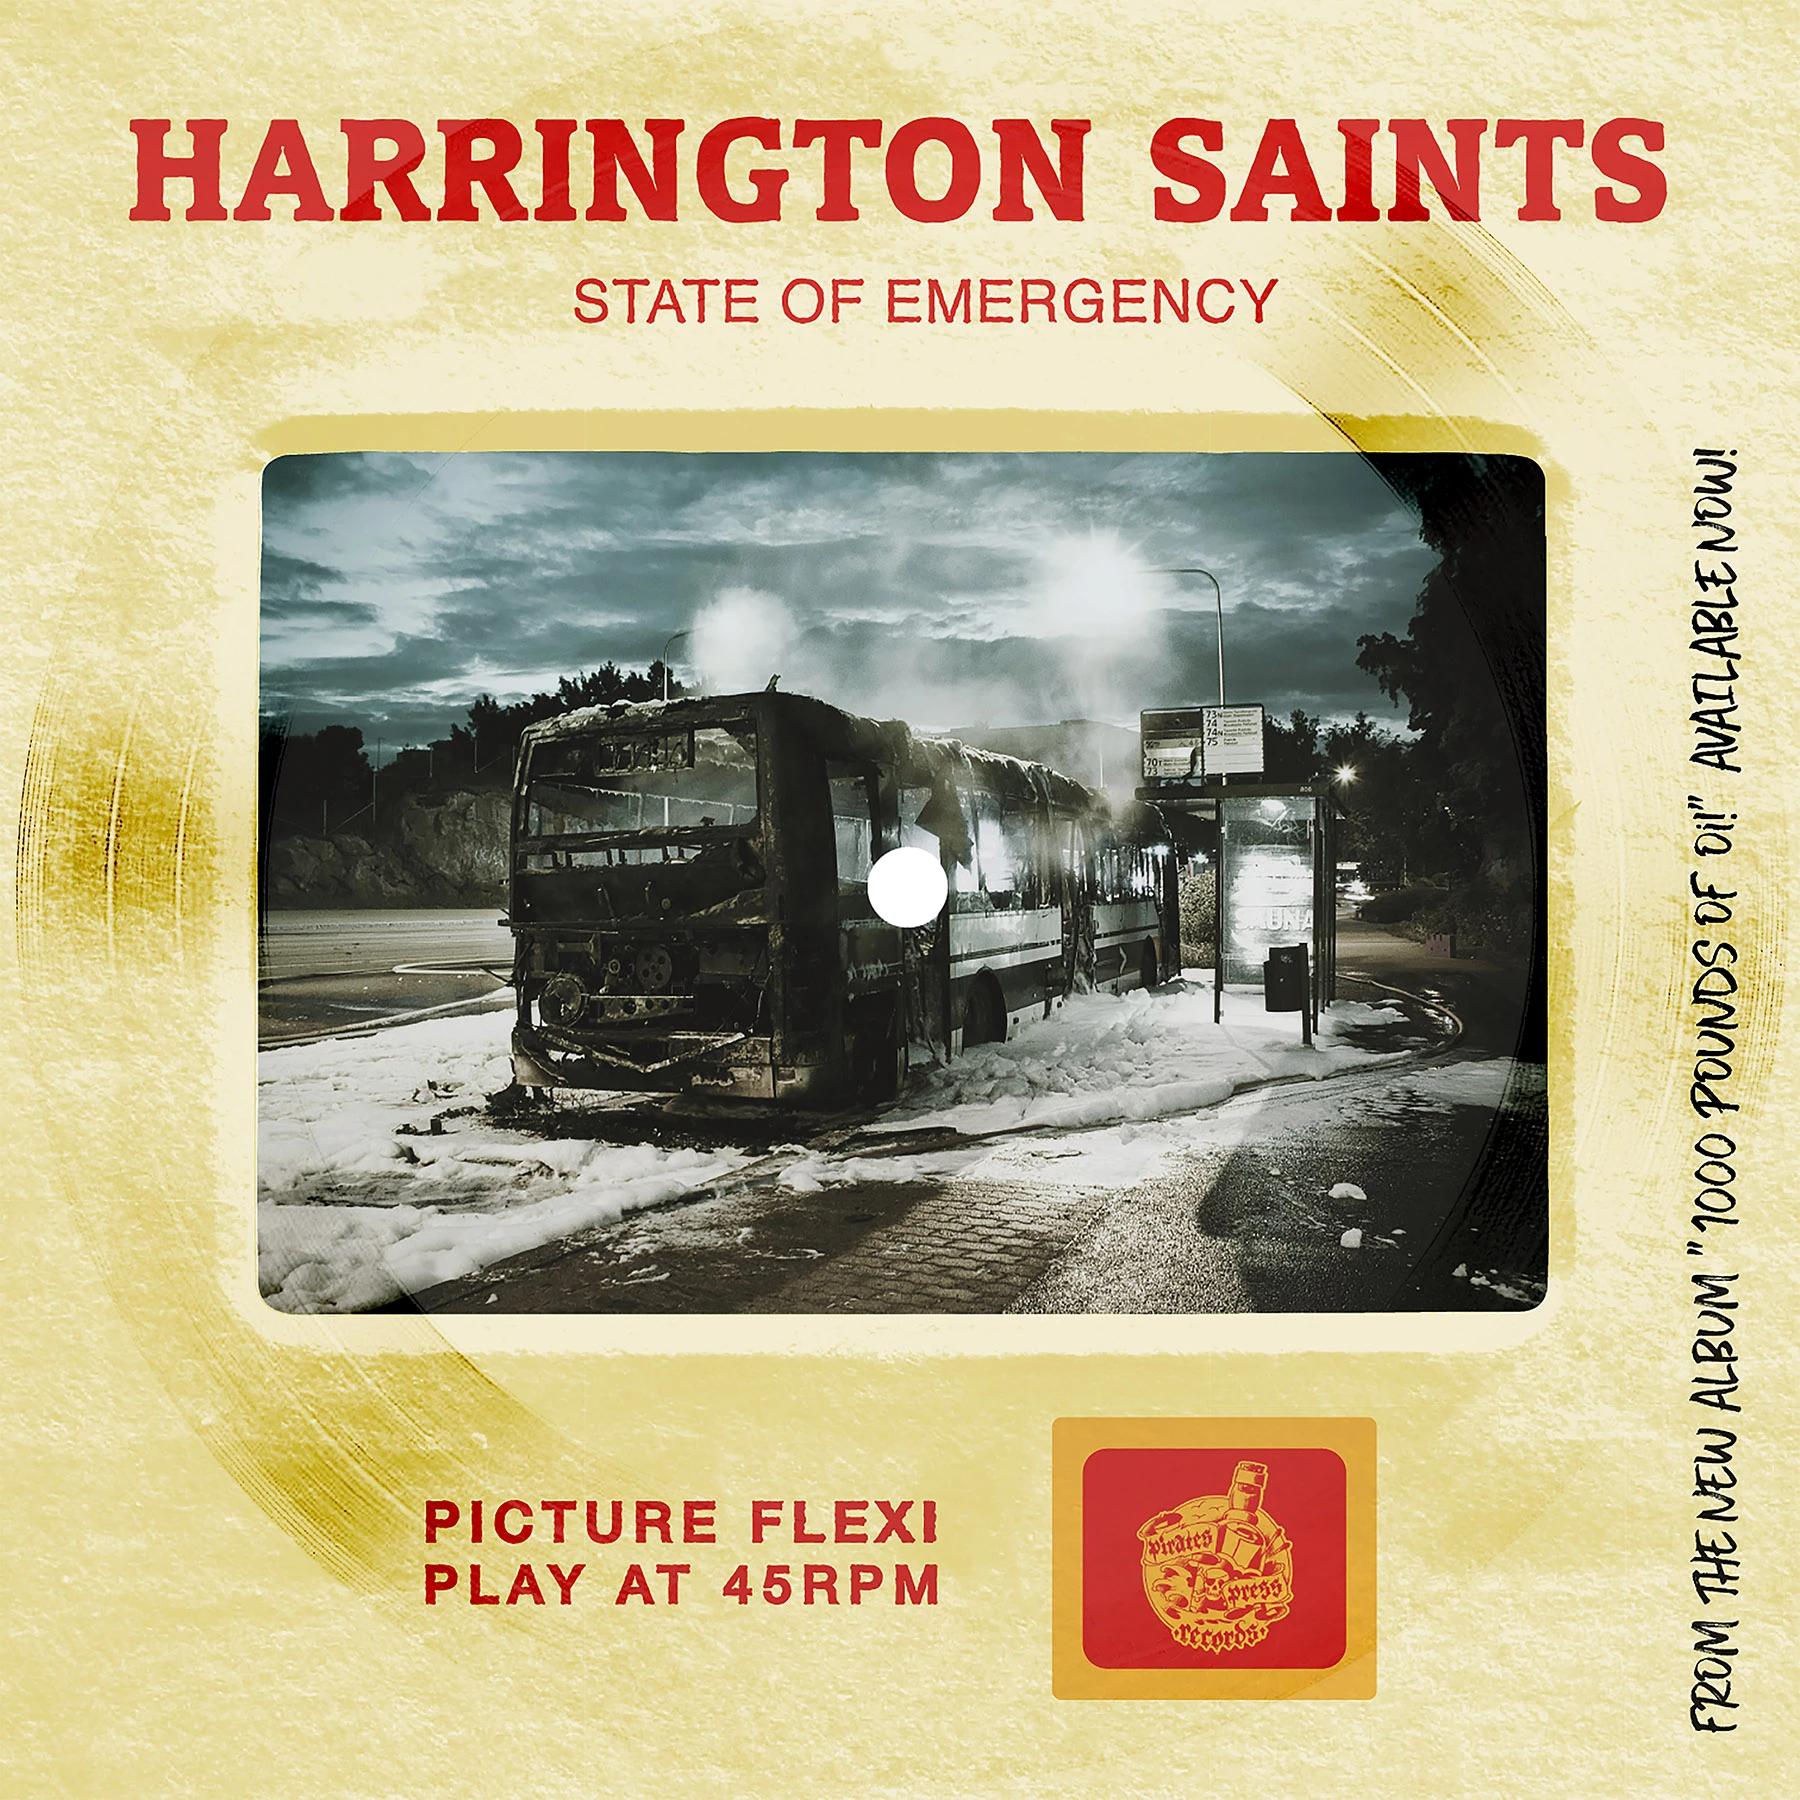 PPR233F2-Harrington-Saints-State-of-Emergency-Slide-Flexi